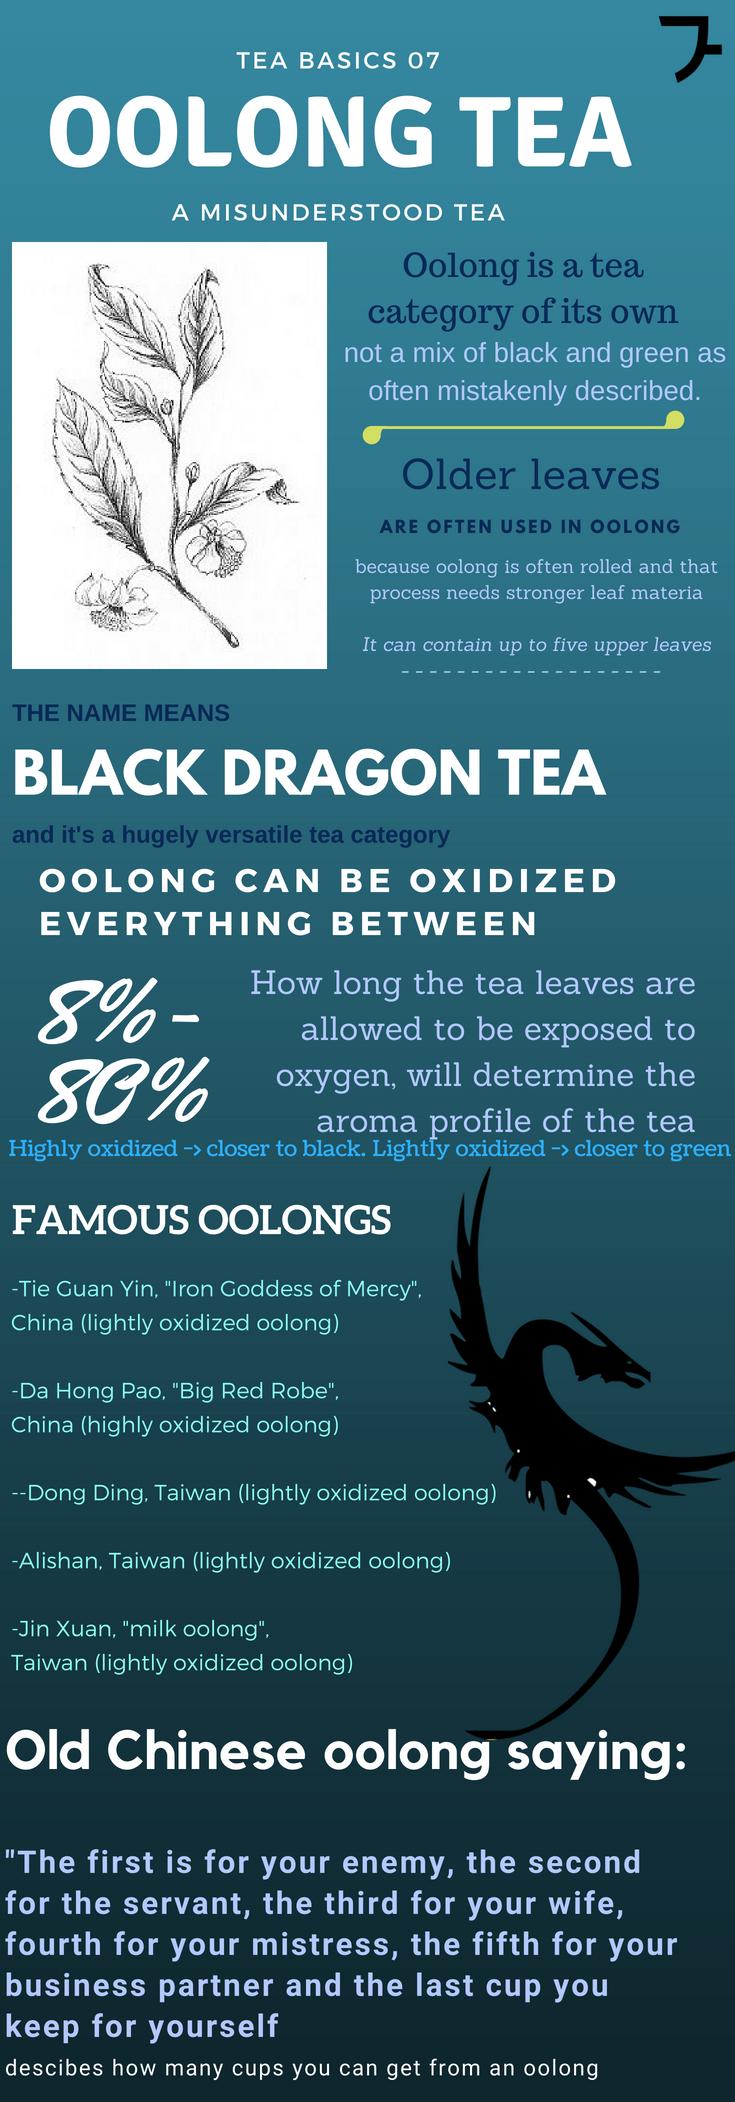 Tea Basics 07.jpg